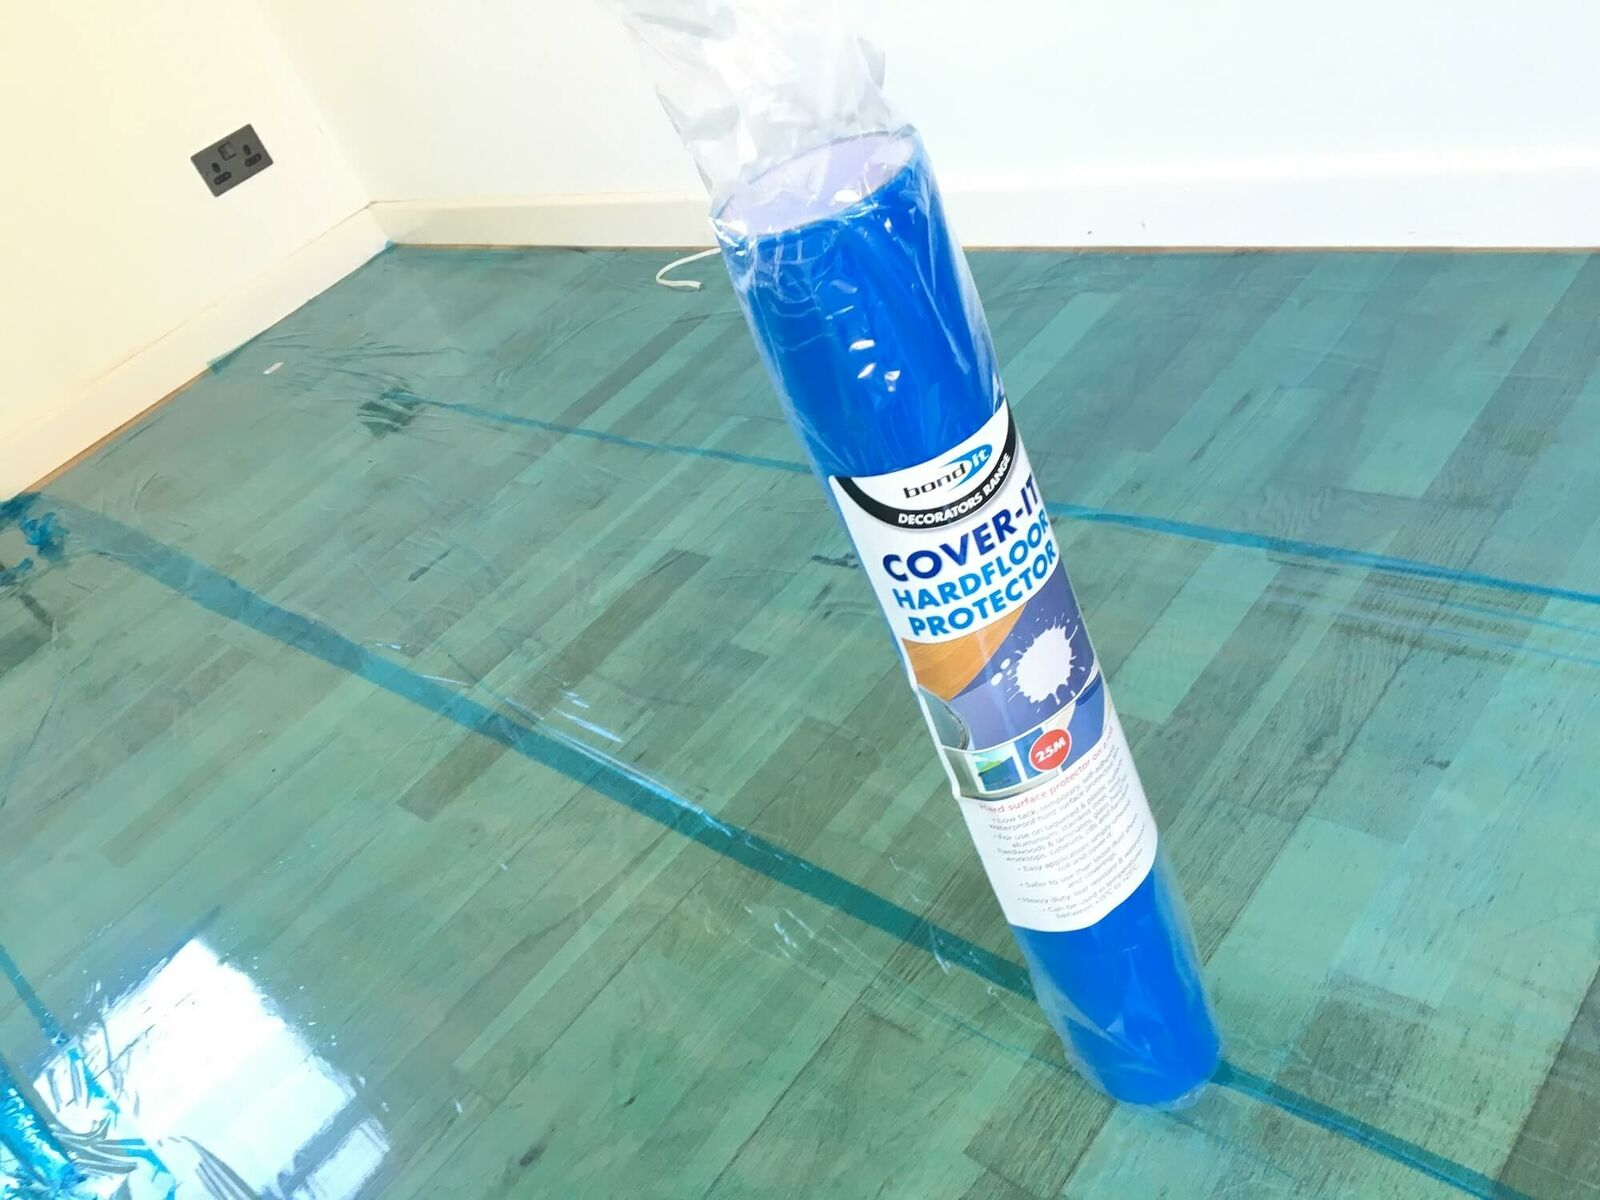 25m 50m 100m Painters Decorators Laminate Floor Tile Protector Sticky Back Roll